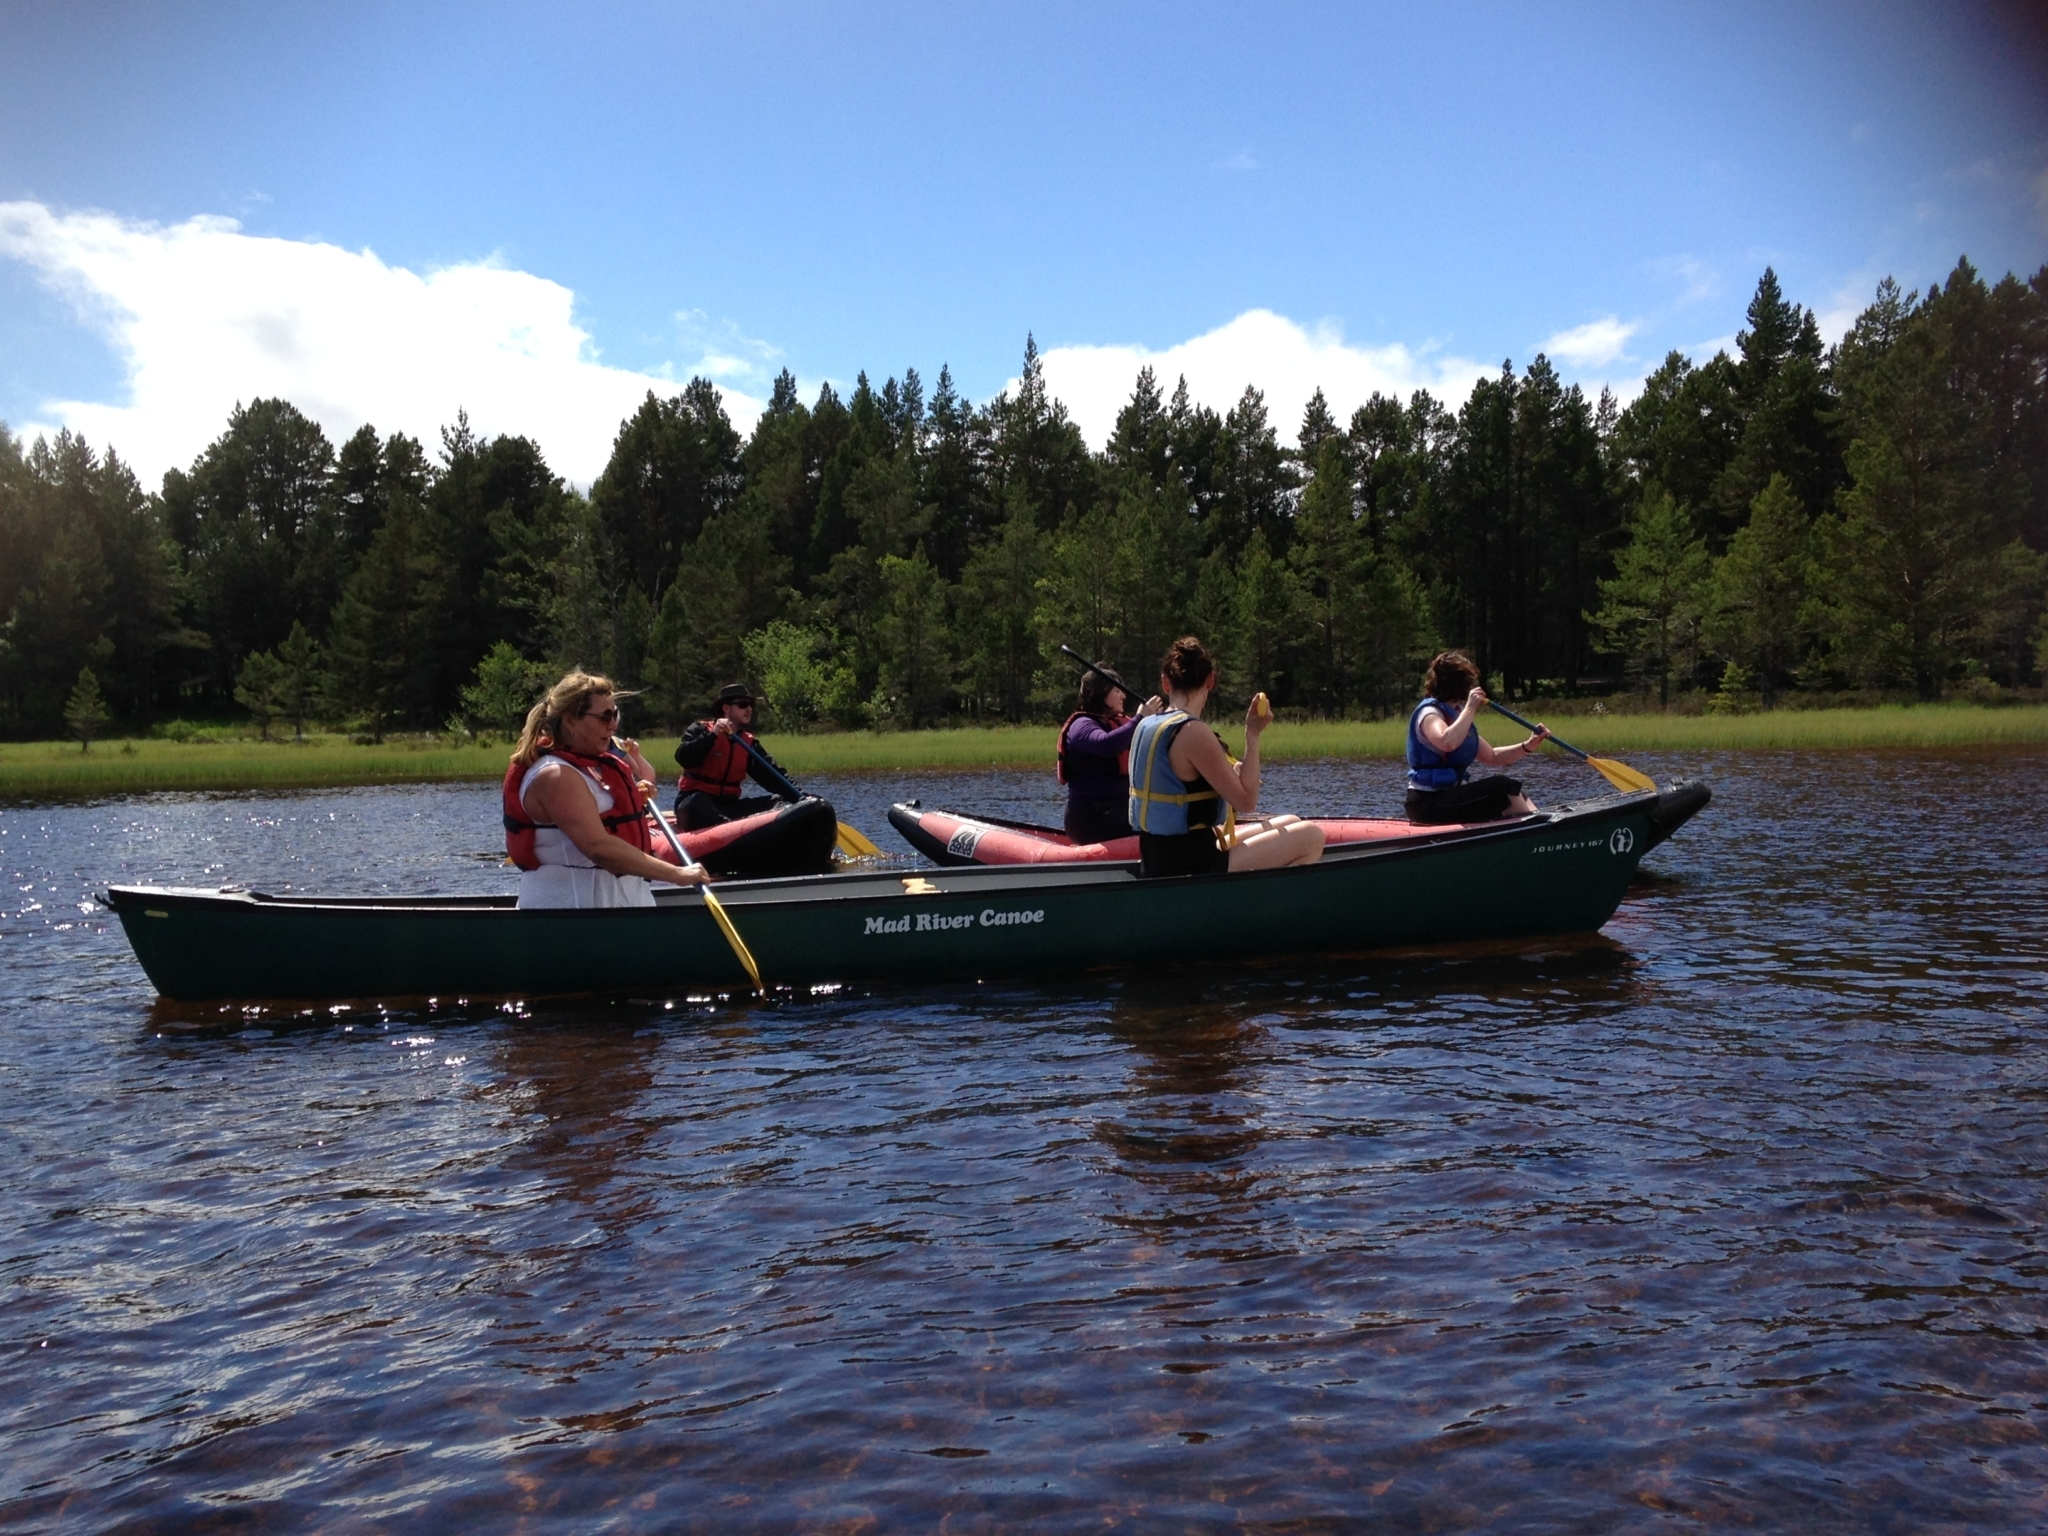 OPTIMA canoeing at Loch Morlich